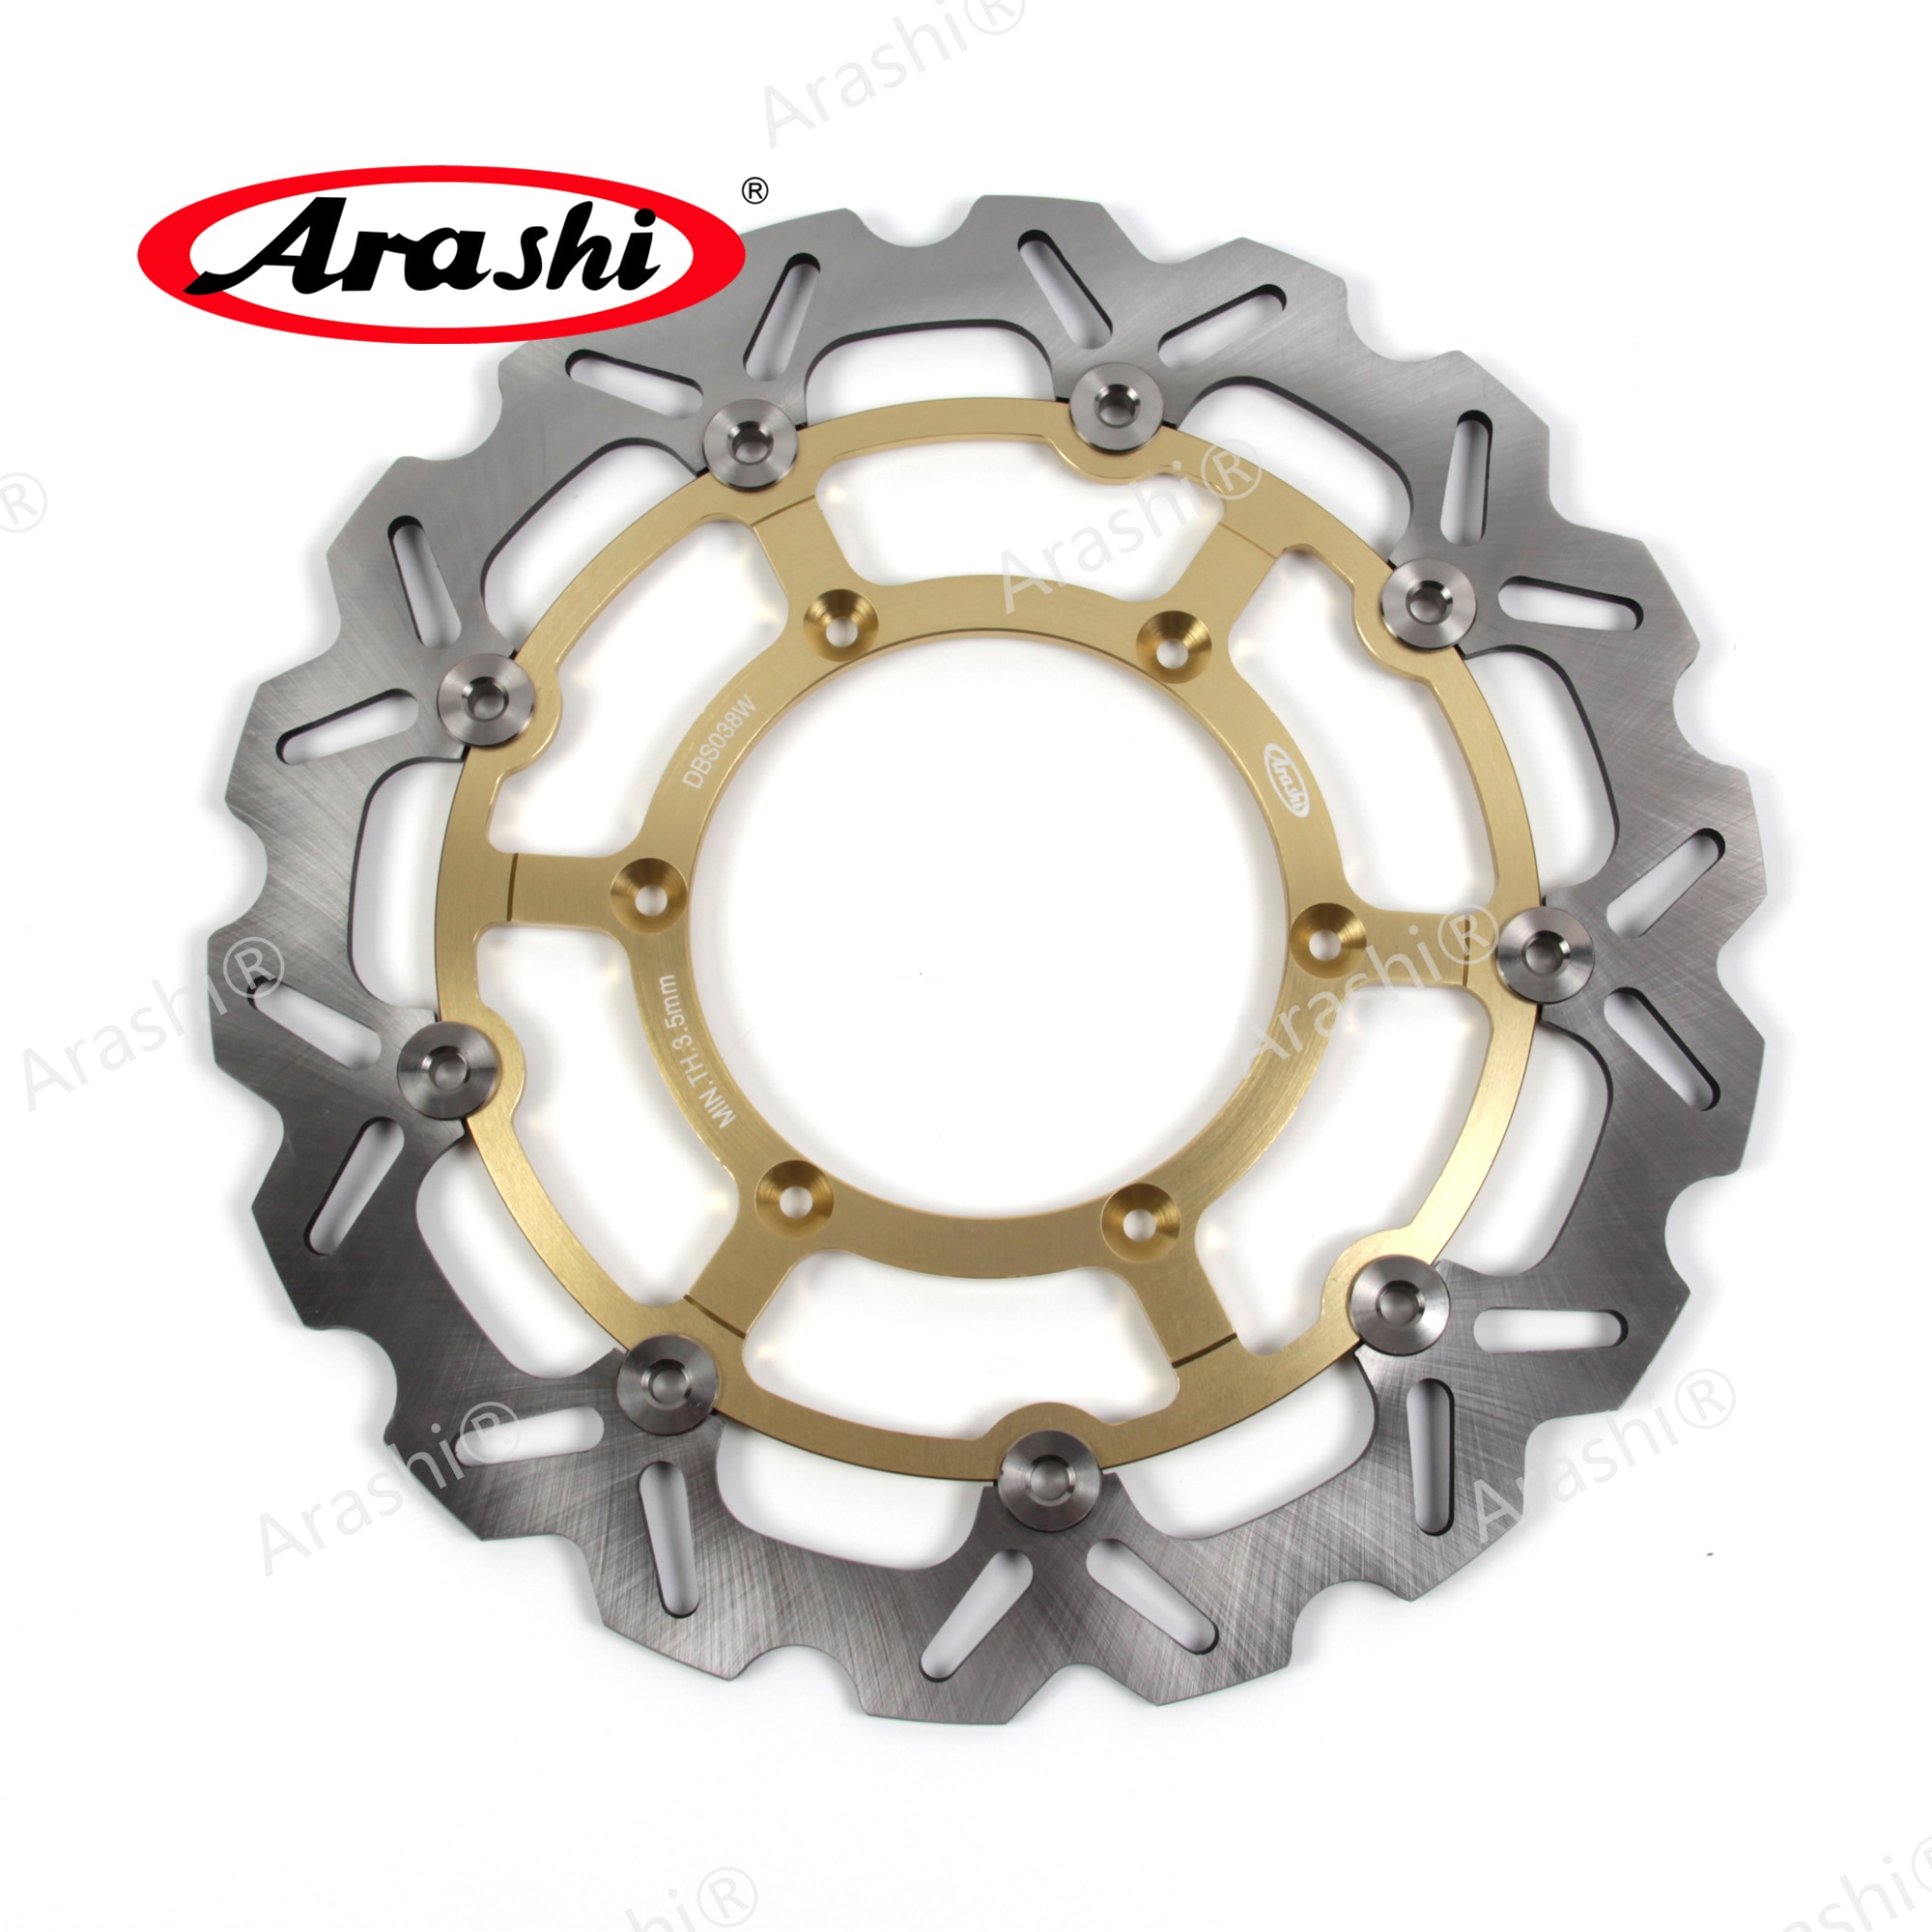 ARASHI CNC передний тормозной диск для SUZUKI DRZ SM 400 2005-2009 тормозные диски роторы DRZ-SM DRZ400SM 2005 2006 2007 2008 2009